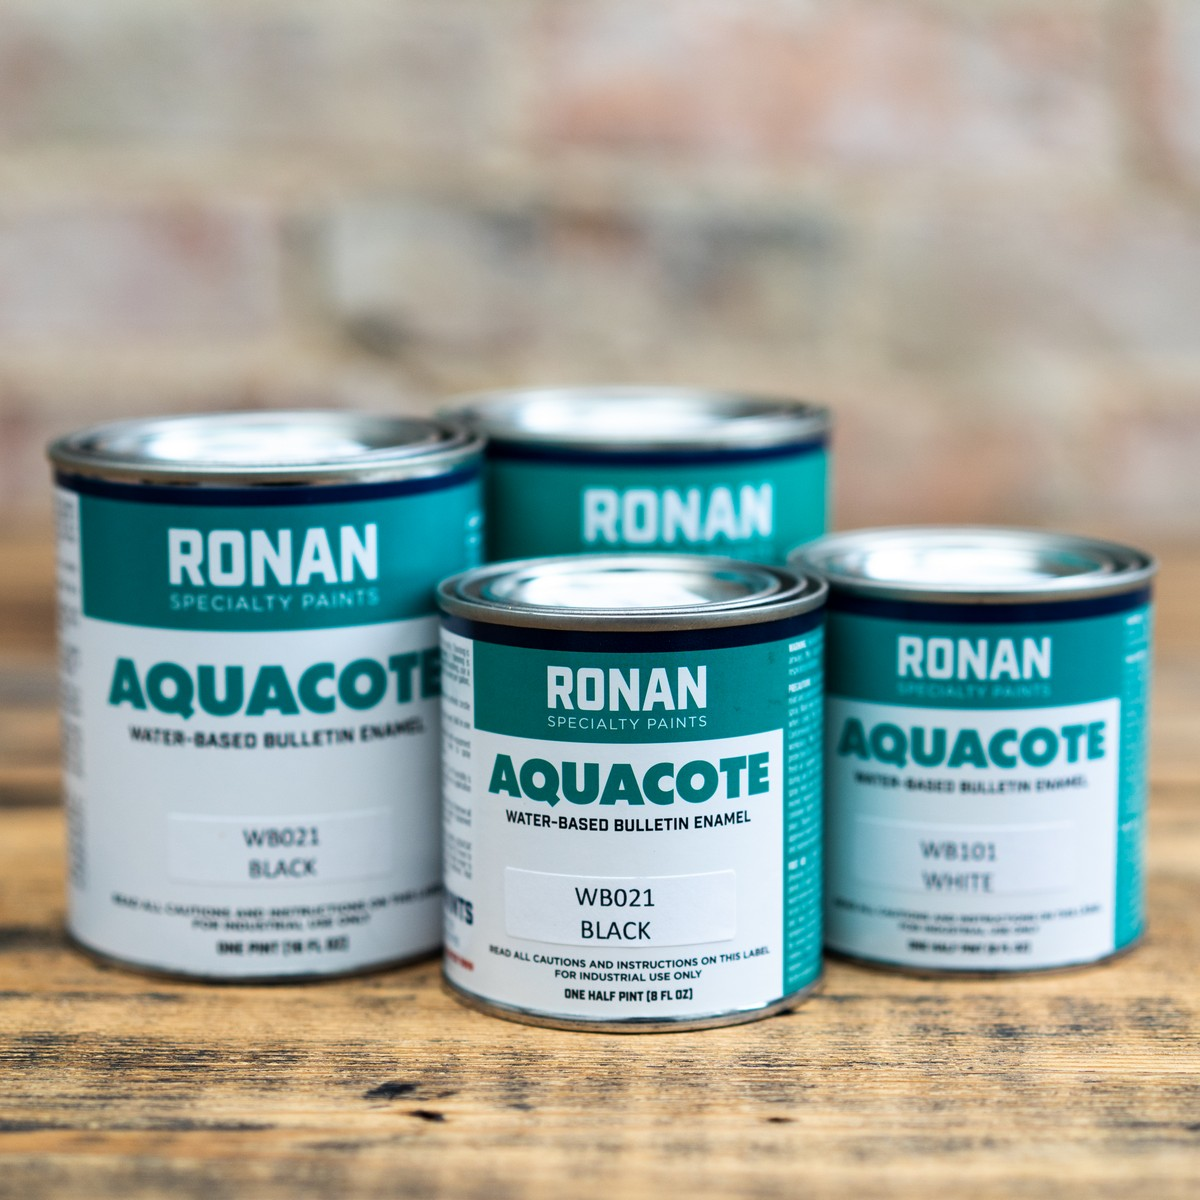 Ronan Aquacote